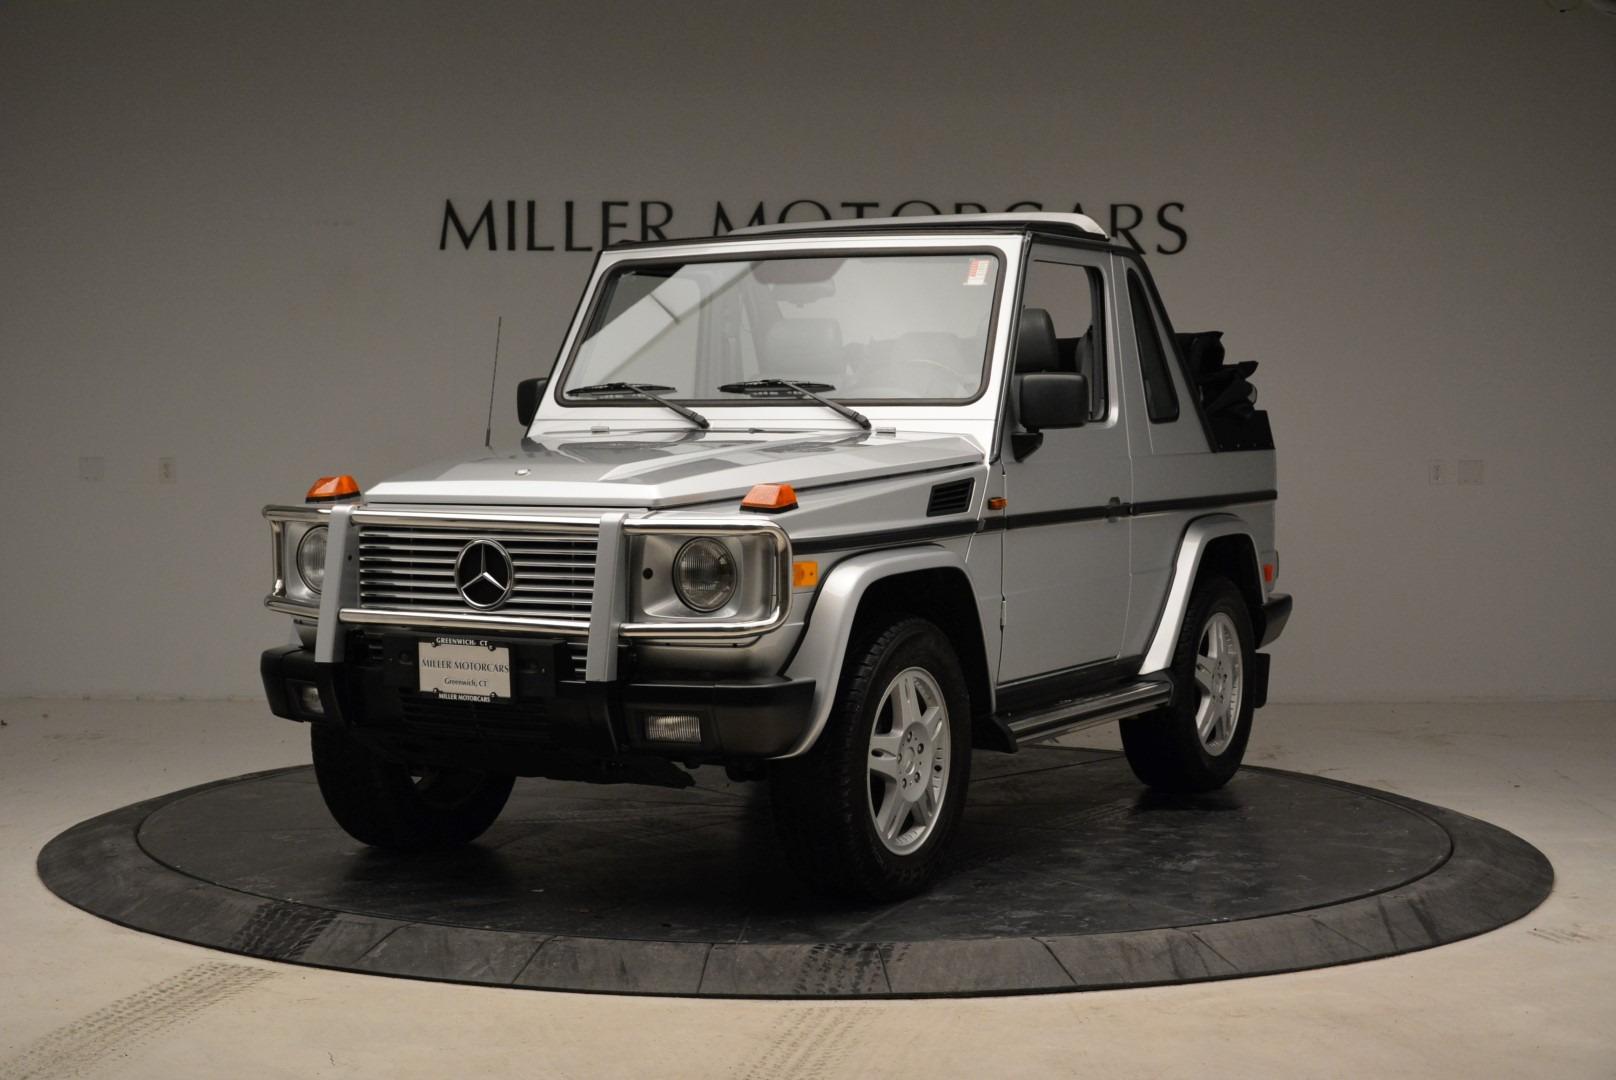 Used 1999 Mercedes Benz G500 Cabriolet for sale Sold at Alfa Romeo of Westport in Westport CT 06880 1